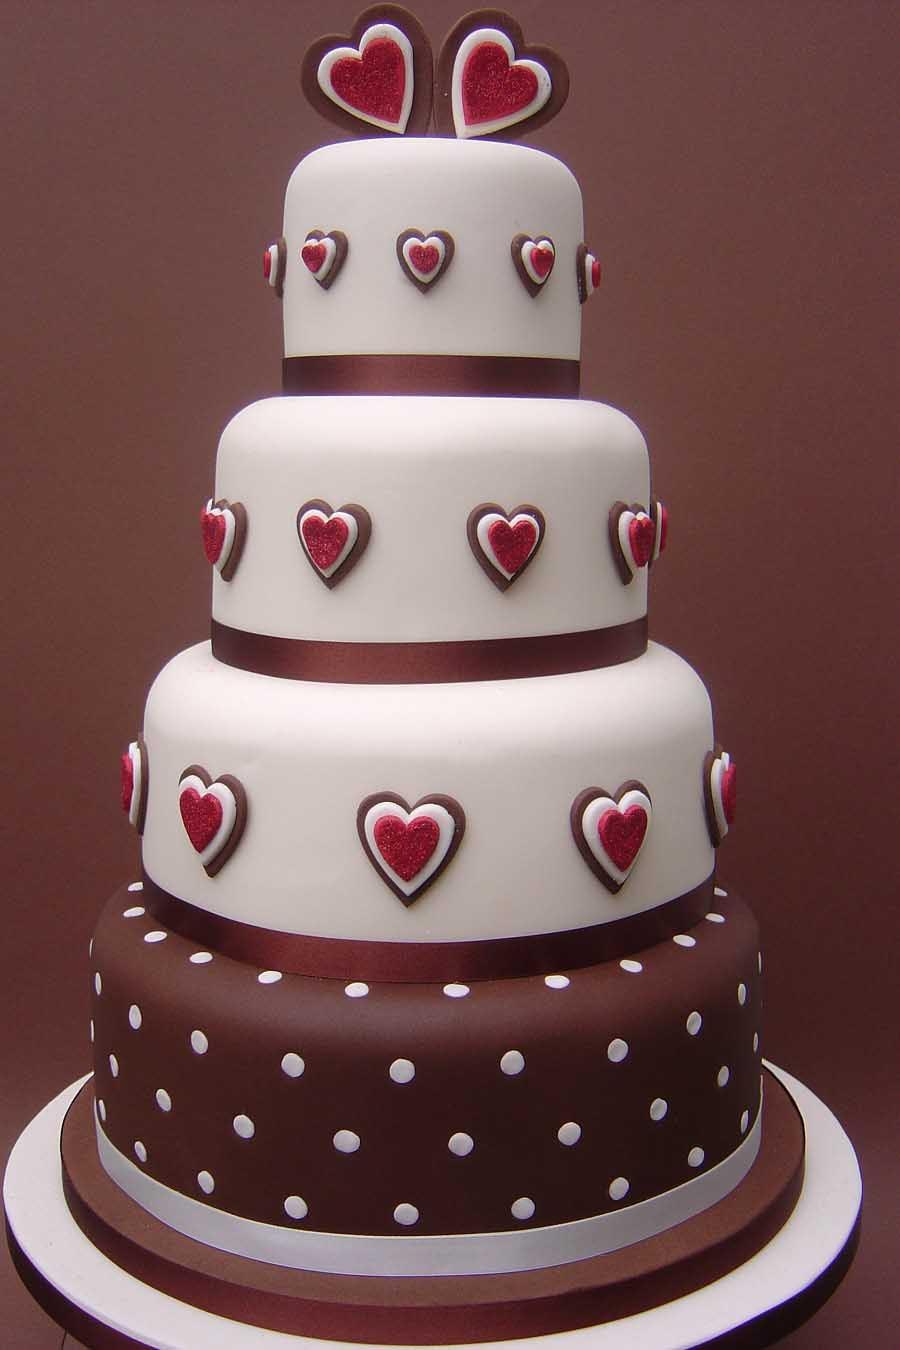 Designer Wedding Cakes  Latest Wedding Cake Designs Starsricha